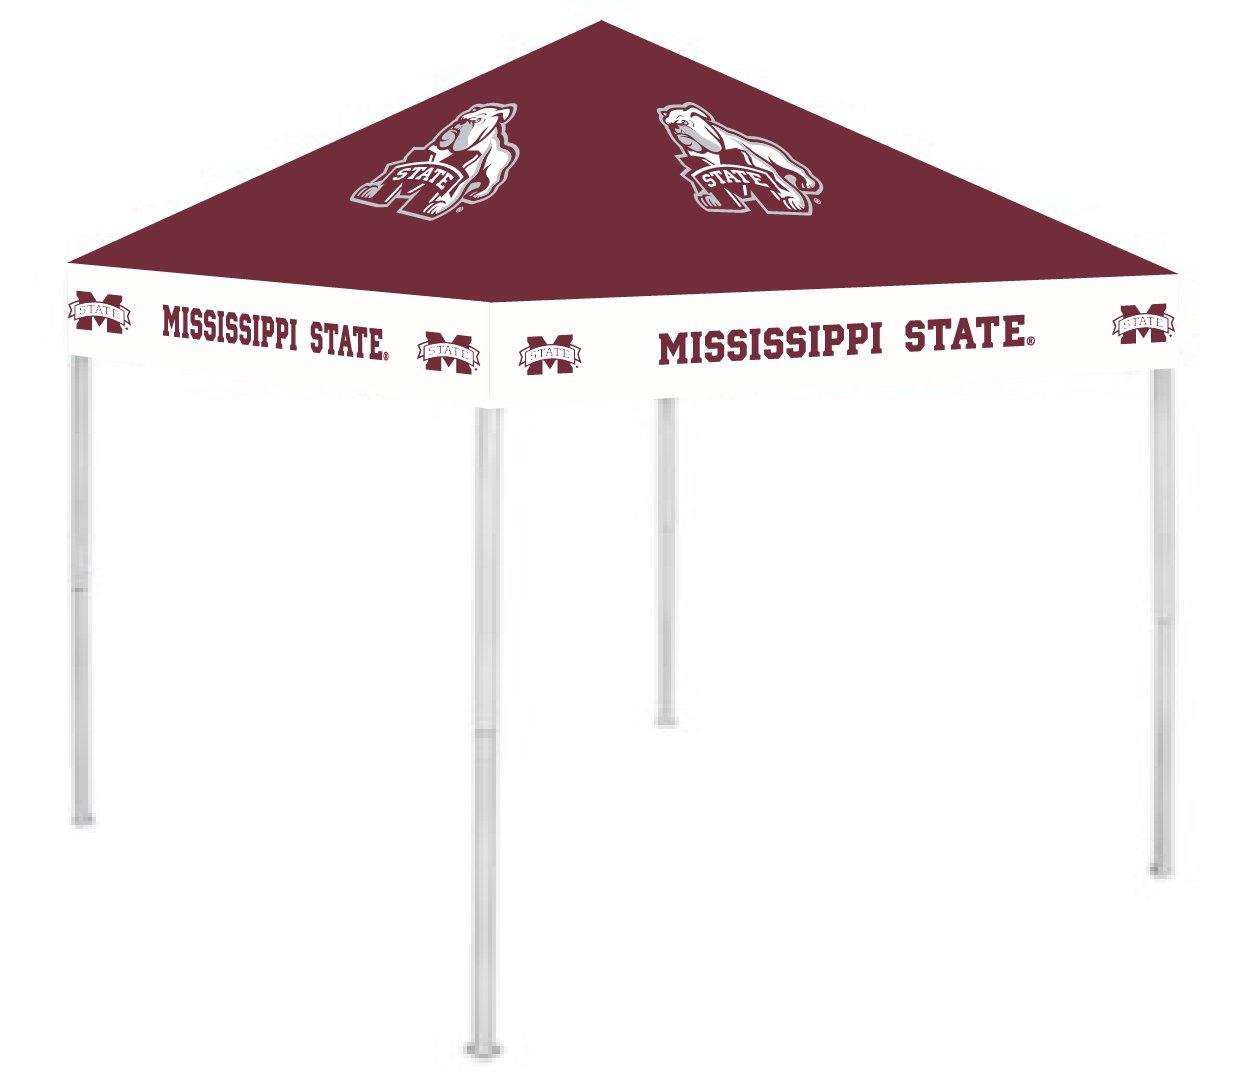 Rivalry RV276-5000 Mississippi State Canopy B001AZOW58 9 x 9 Mississippi State Bulldogs Mississippi State Bulldogs 9 x 9